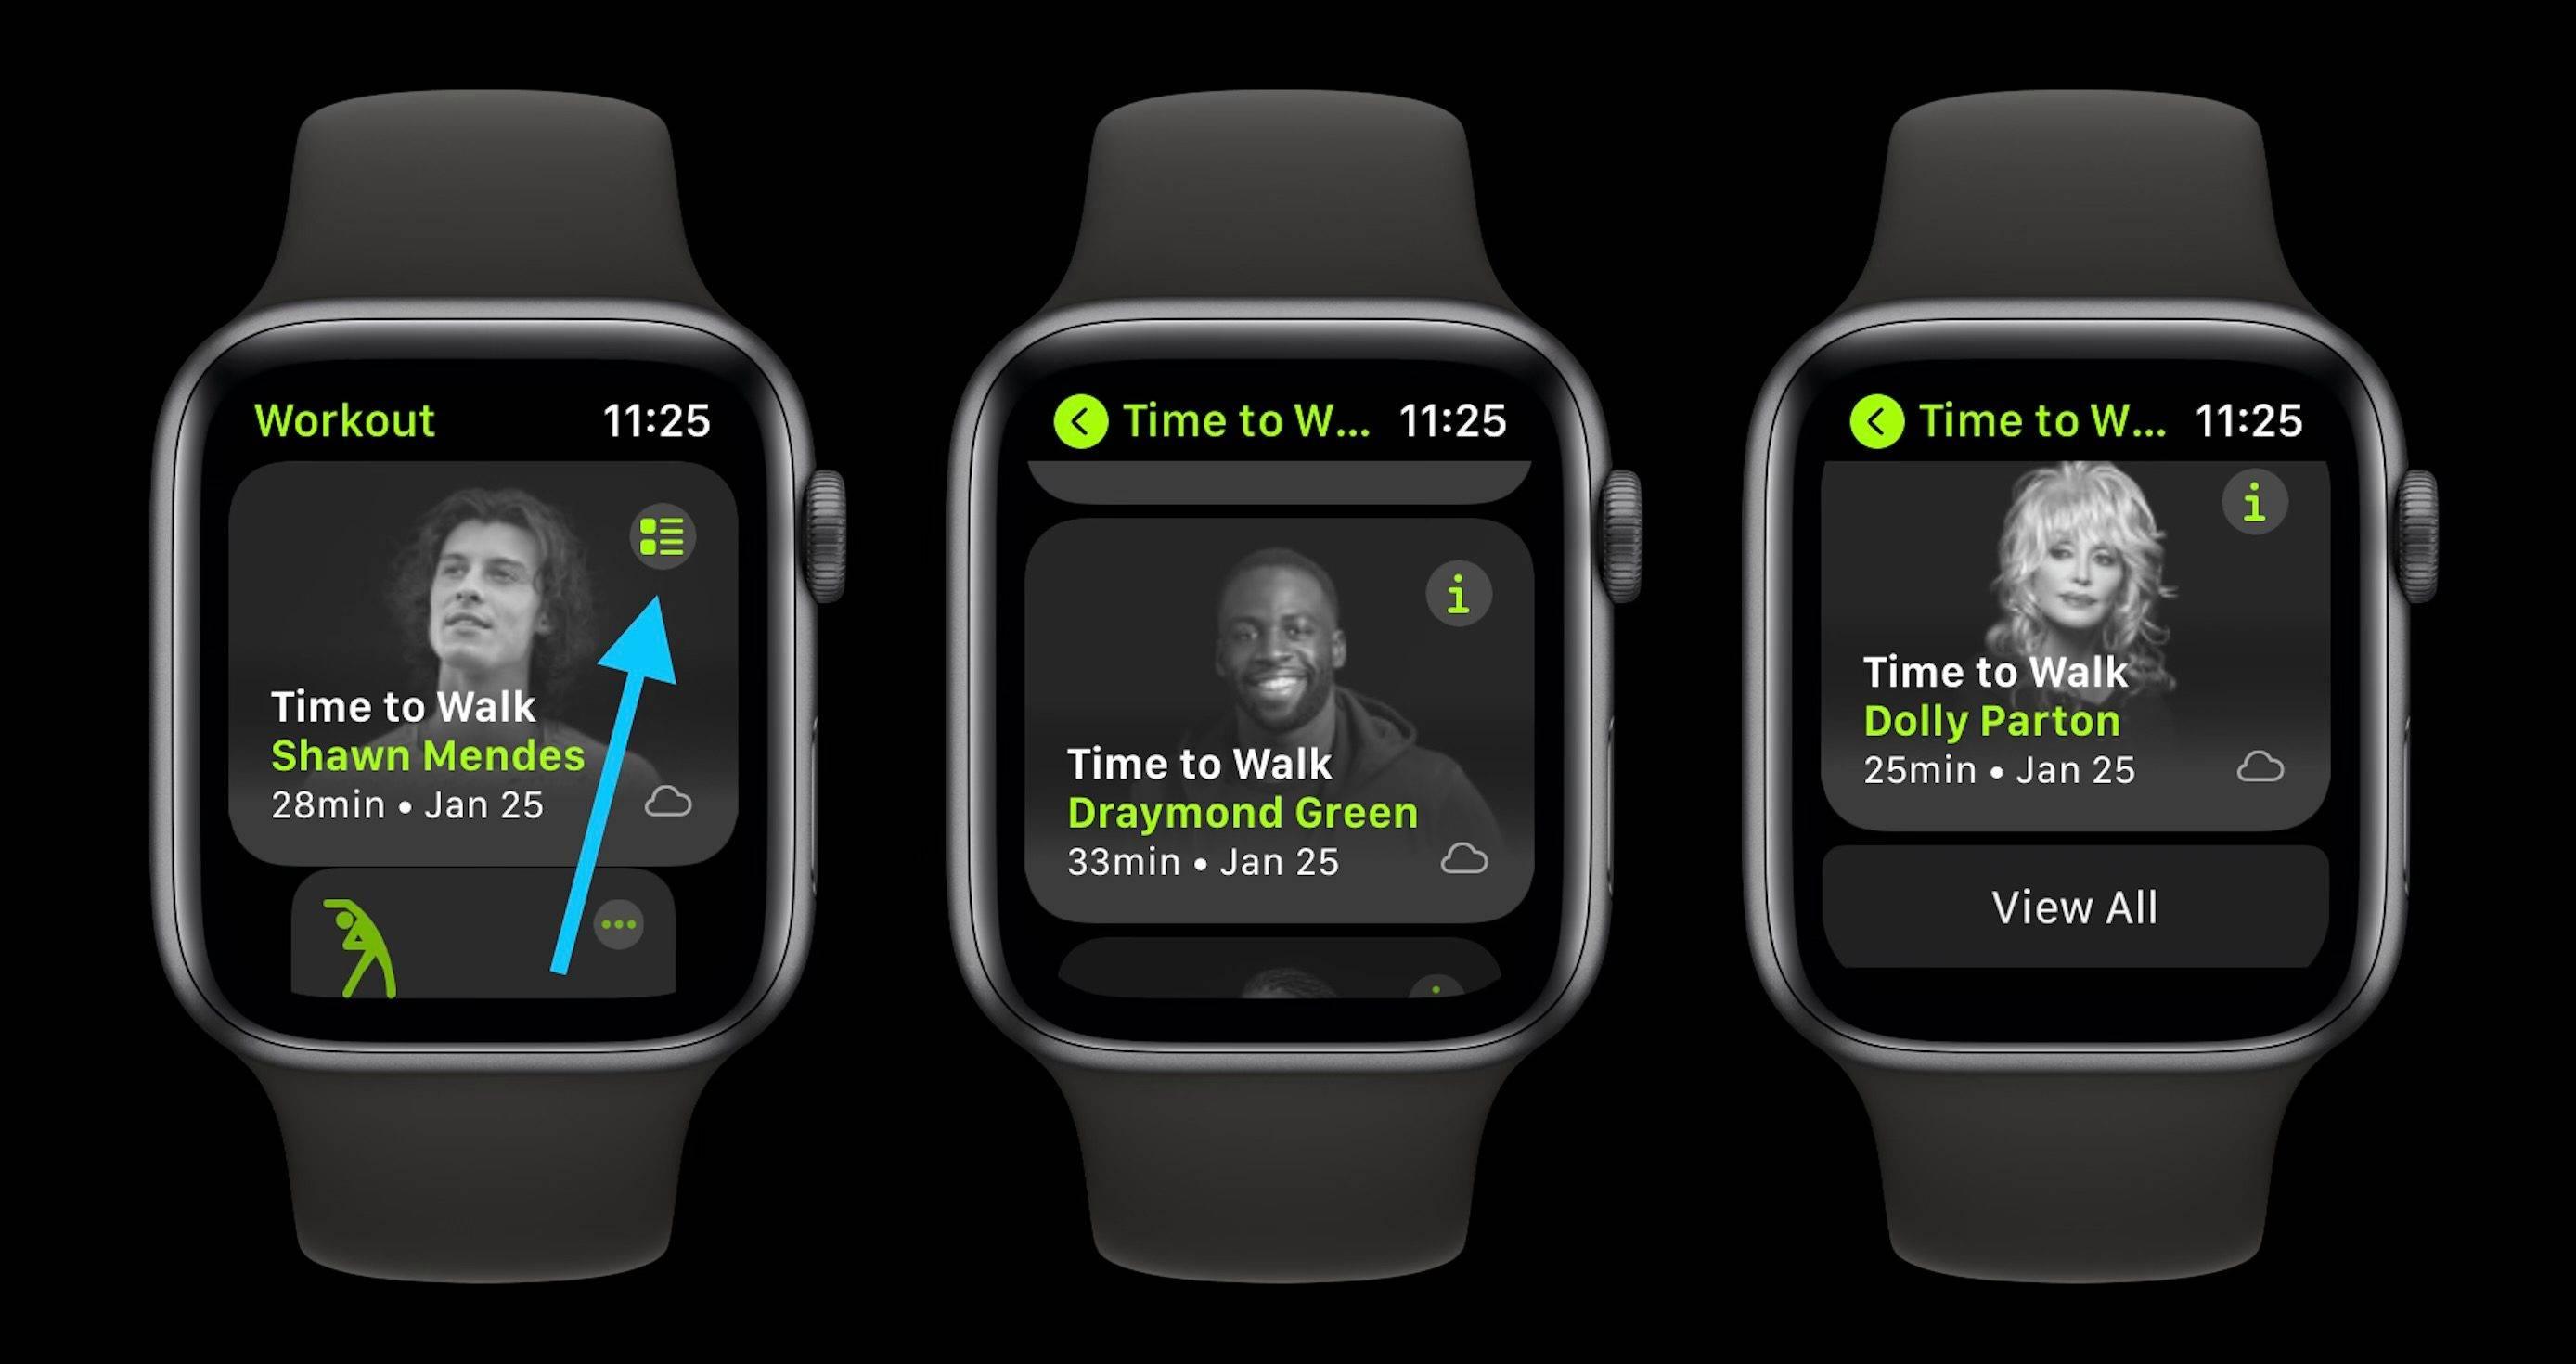 Apple Watch Fitness +功能怎么用行走时间?如何使用行走时间